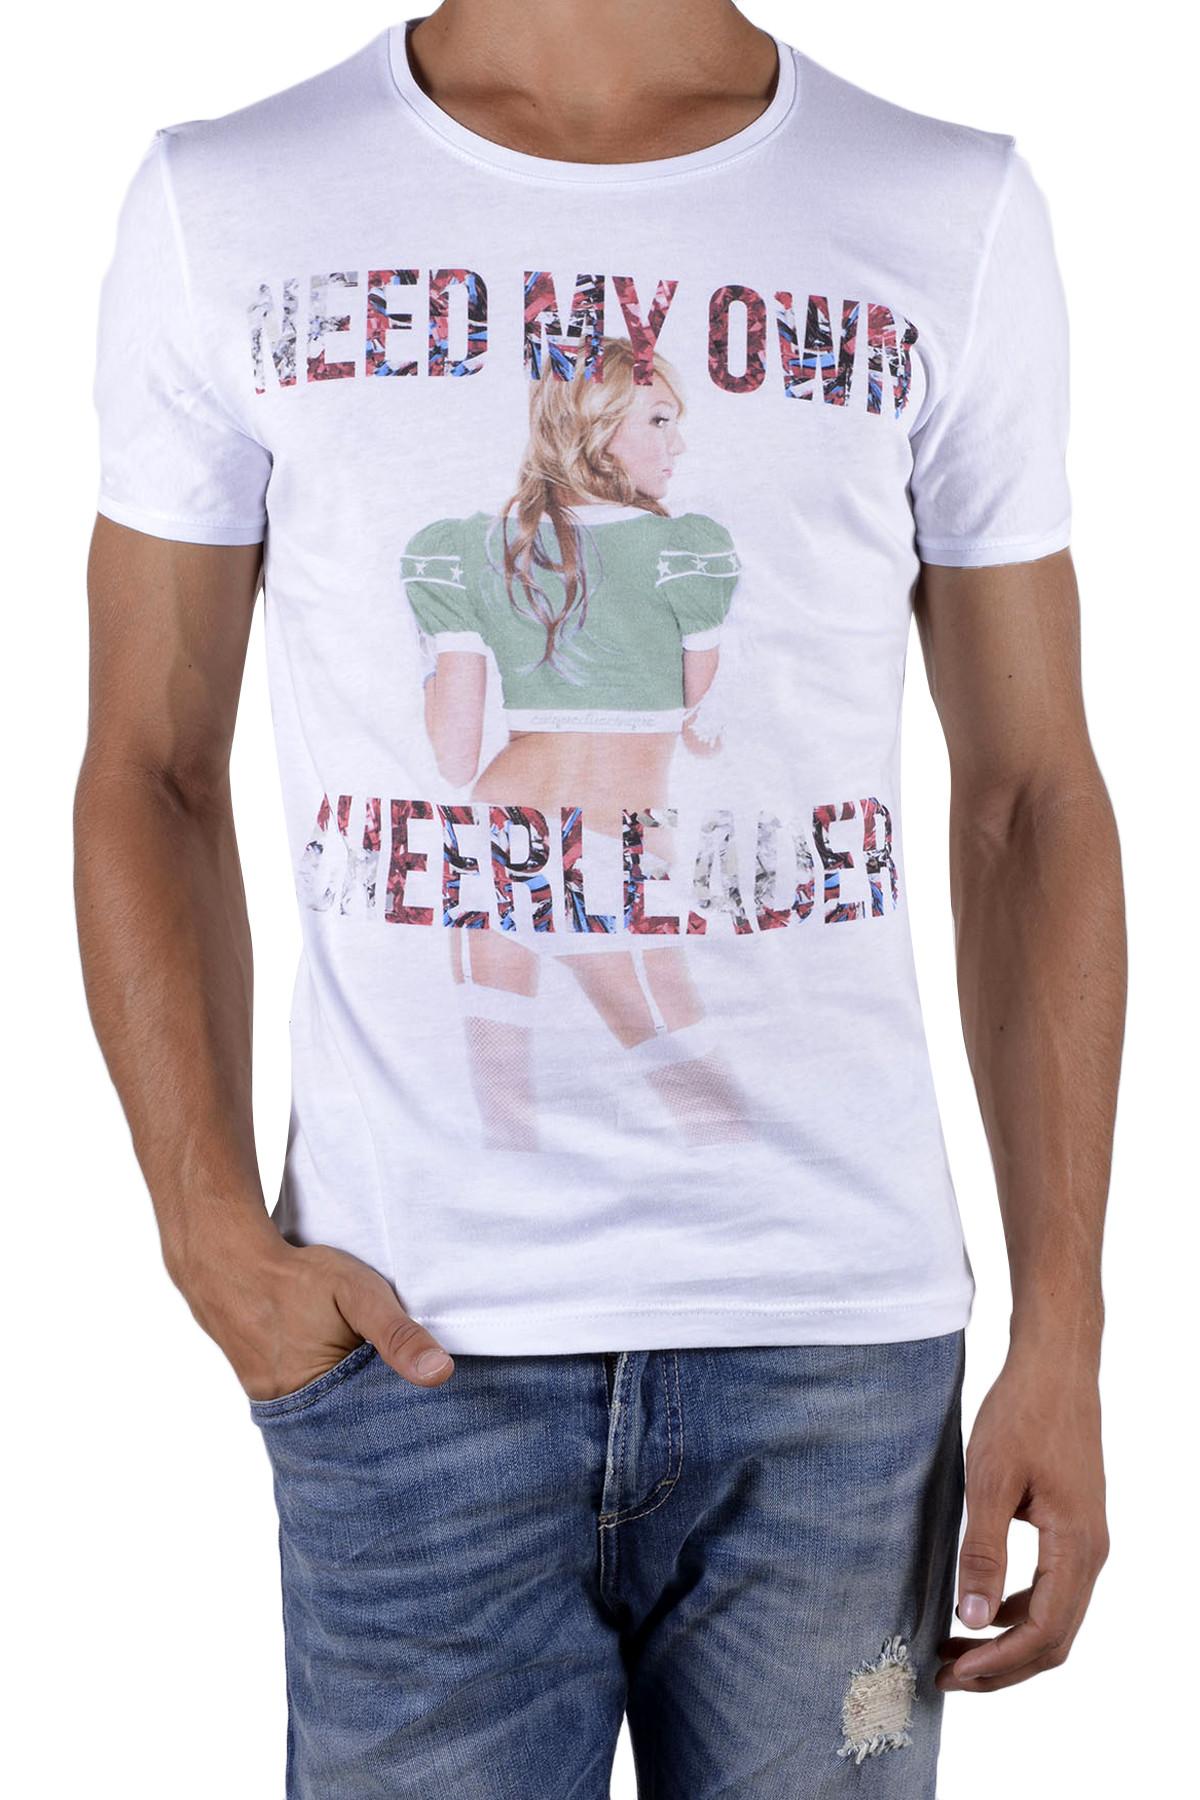 525Marchio: 525; Genere: Uomo; Tipologia: T-shirt;